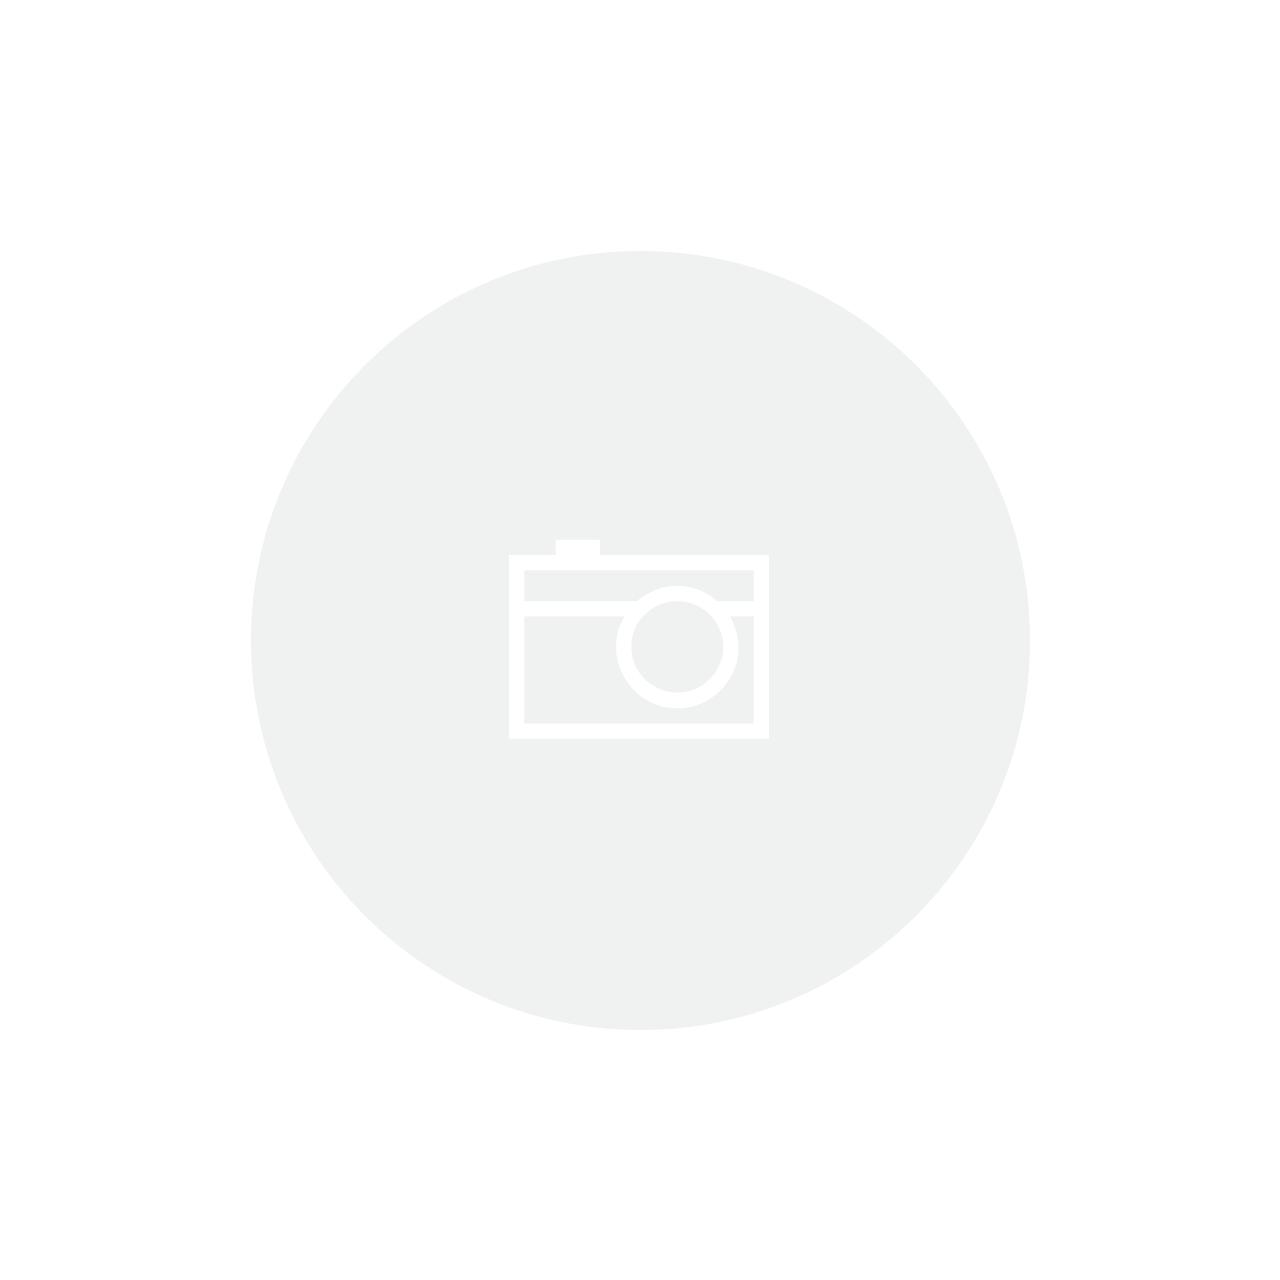 PLACA MAE GIGABYTE GA-X99P-SLI INTEL LGA 2011-3, CHIPSET INTEL X99